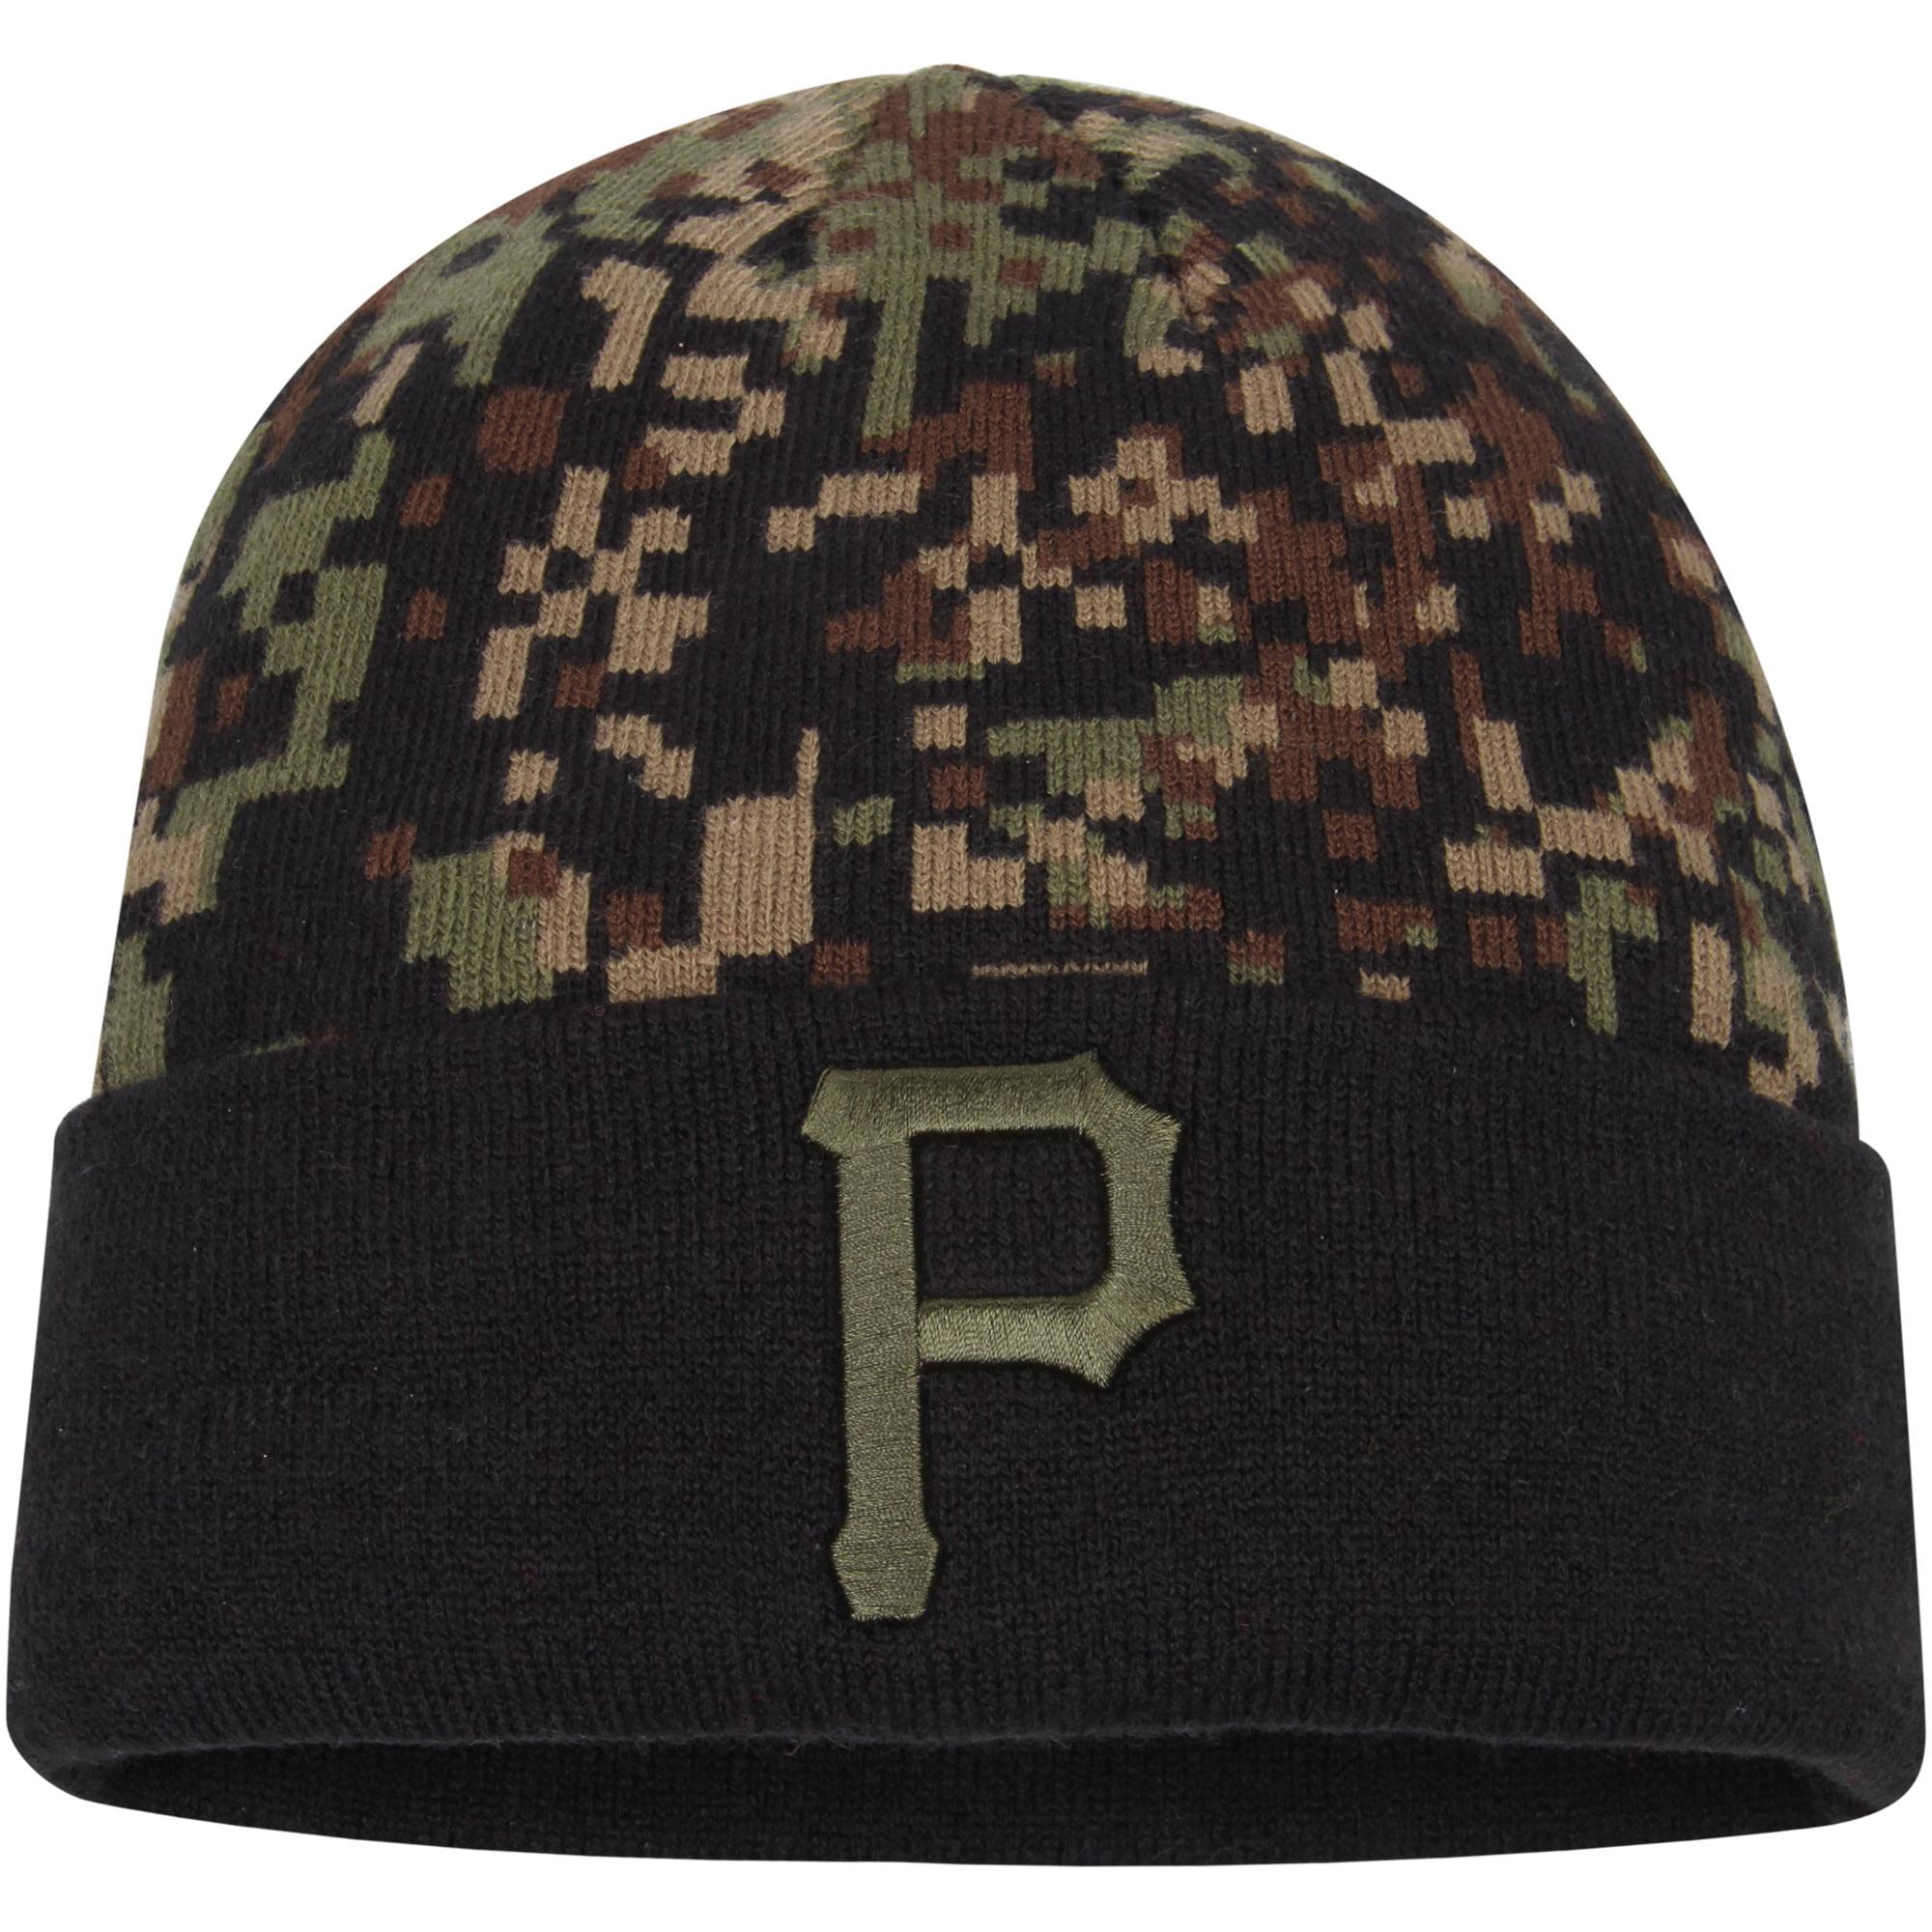 Pittsburgh Pirates New Era Print Play Knit Hat - Camo/Black - OSFA